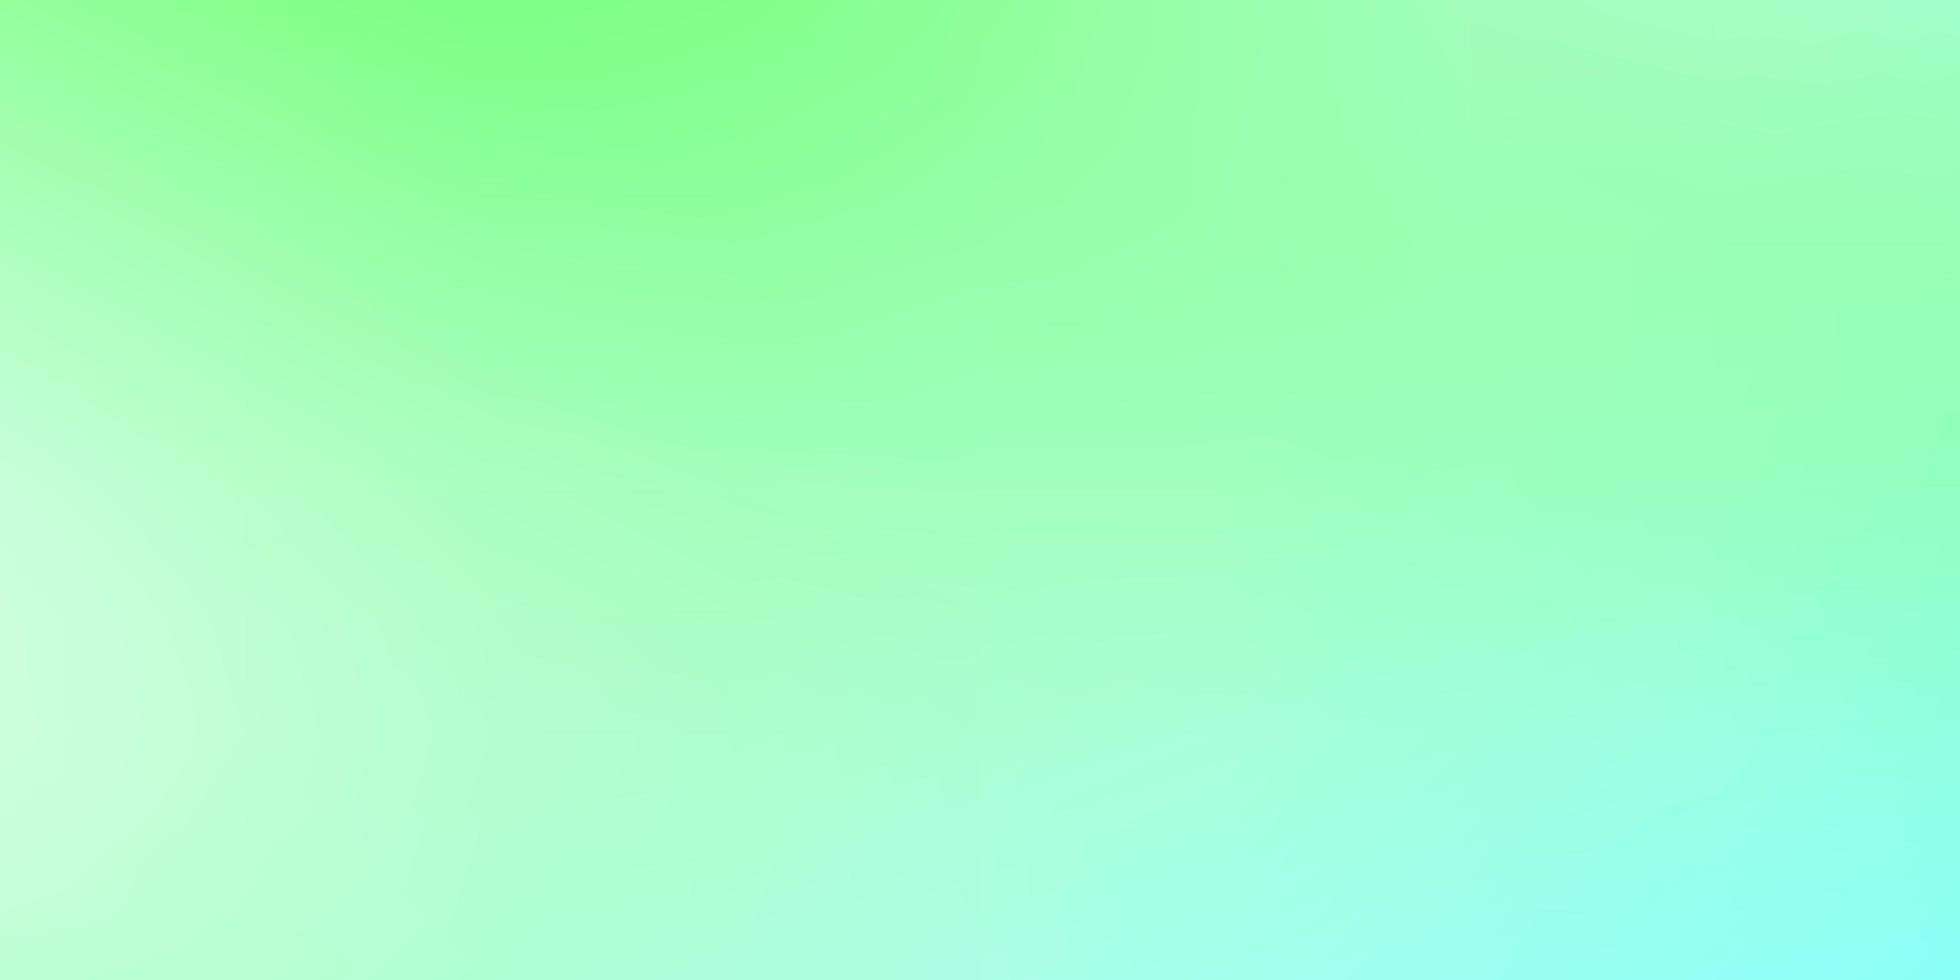 luz verde vetor turva fundo colorido.